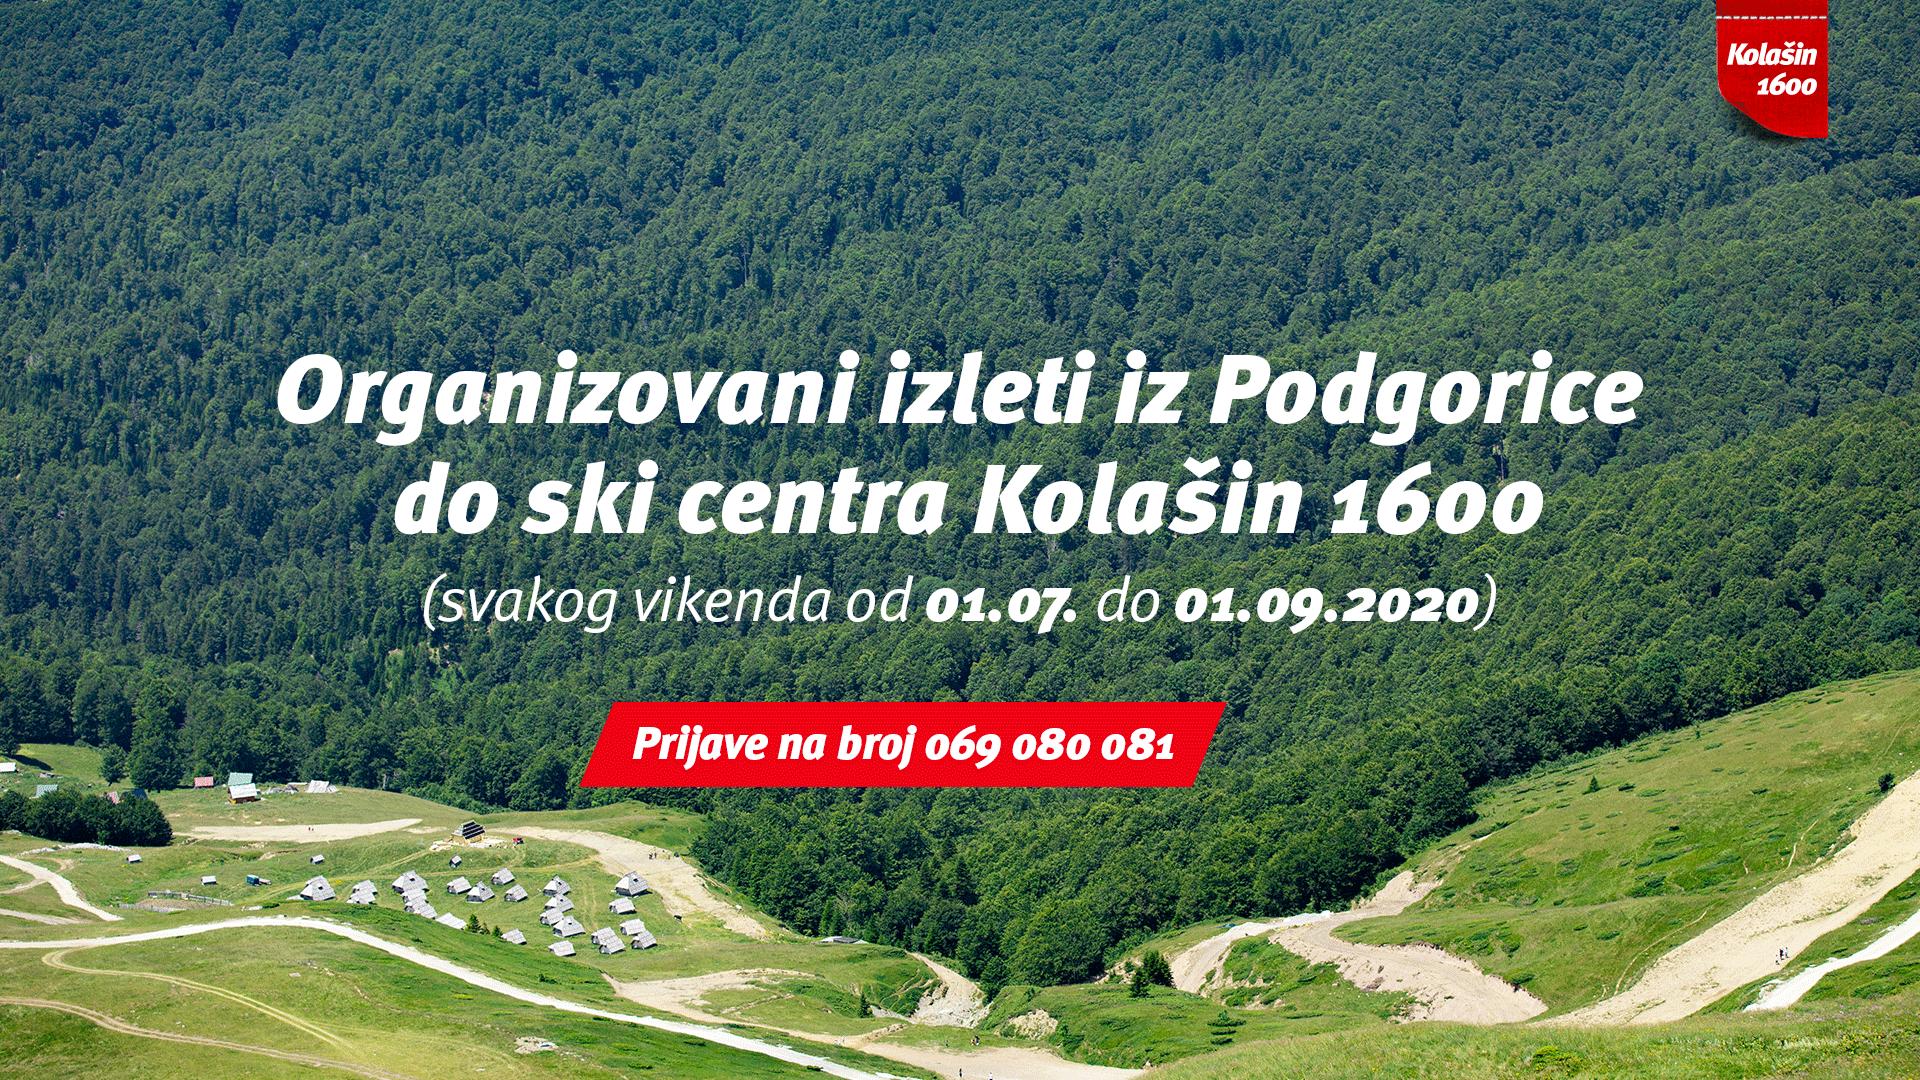 Svakog vikenda izleti iz Podgorice do ski centra Kolašin 1600